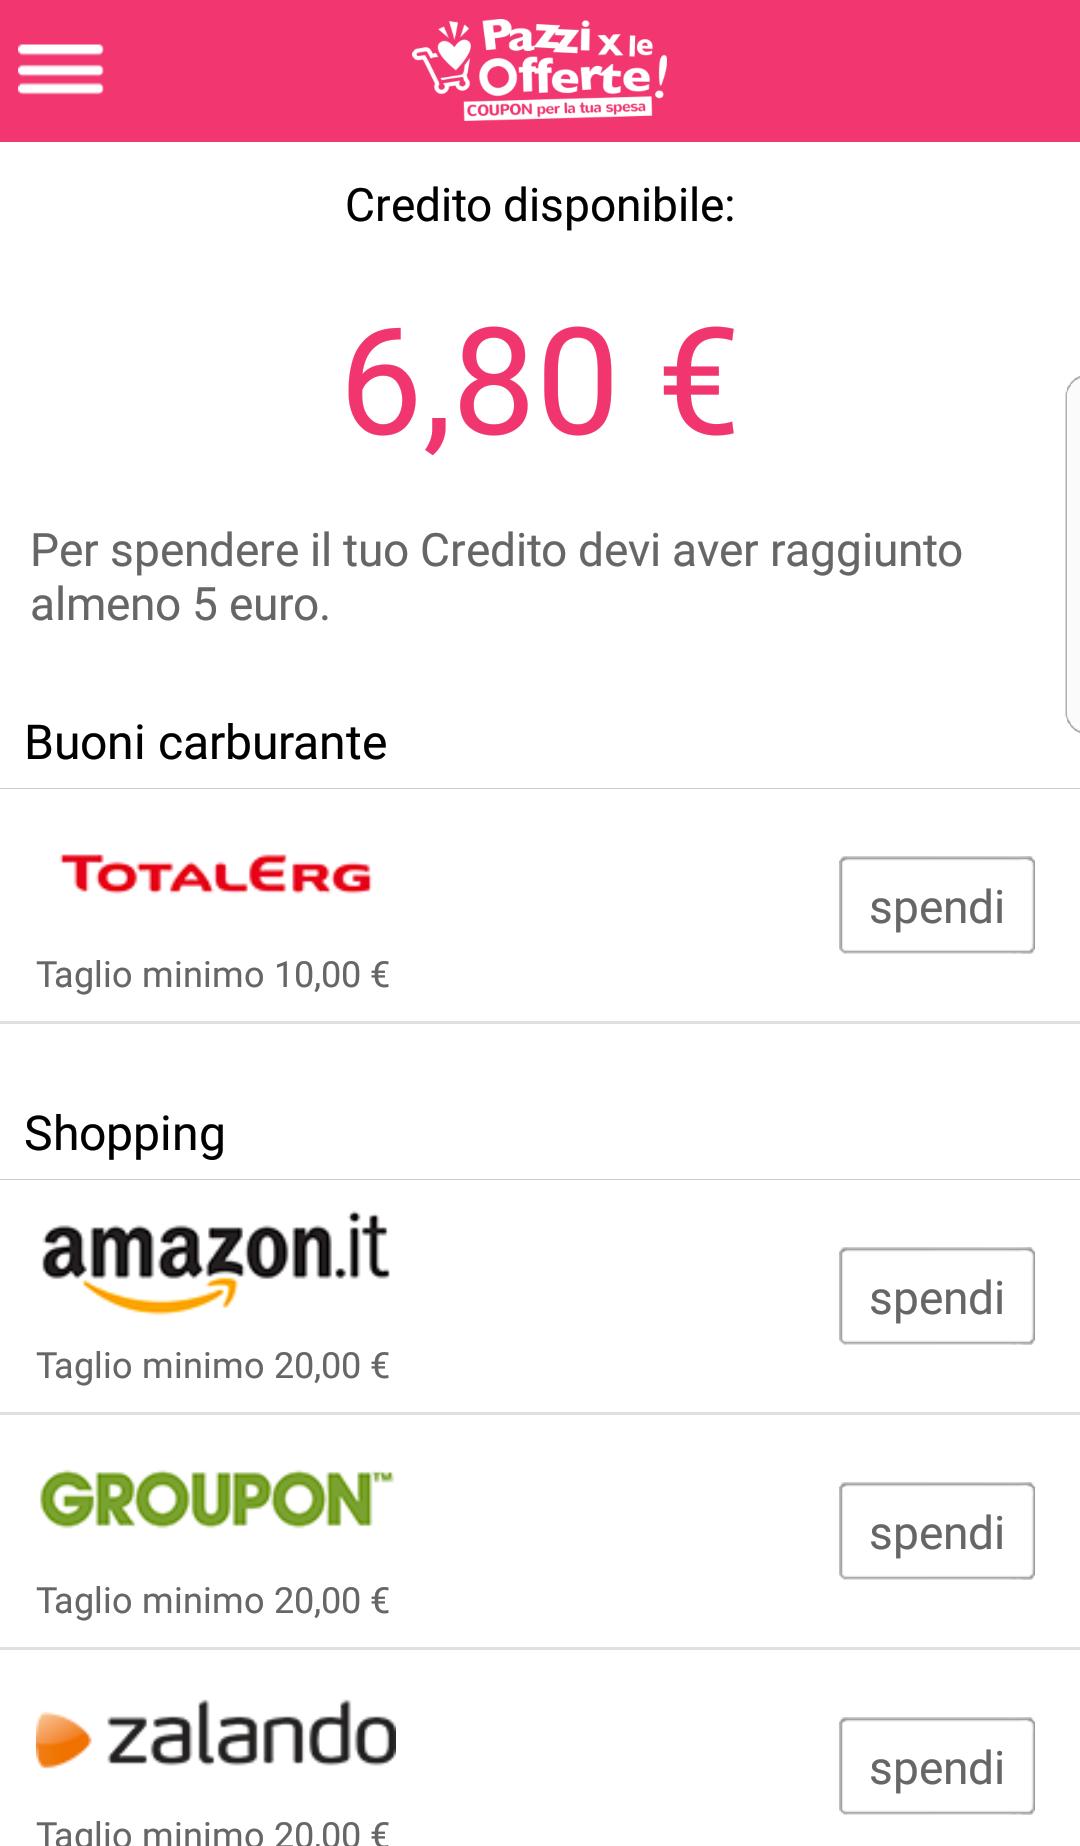 Edenred e coupons